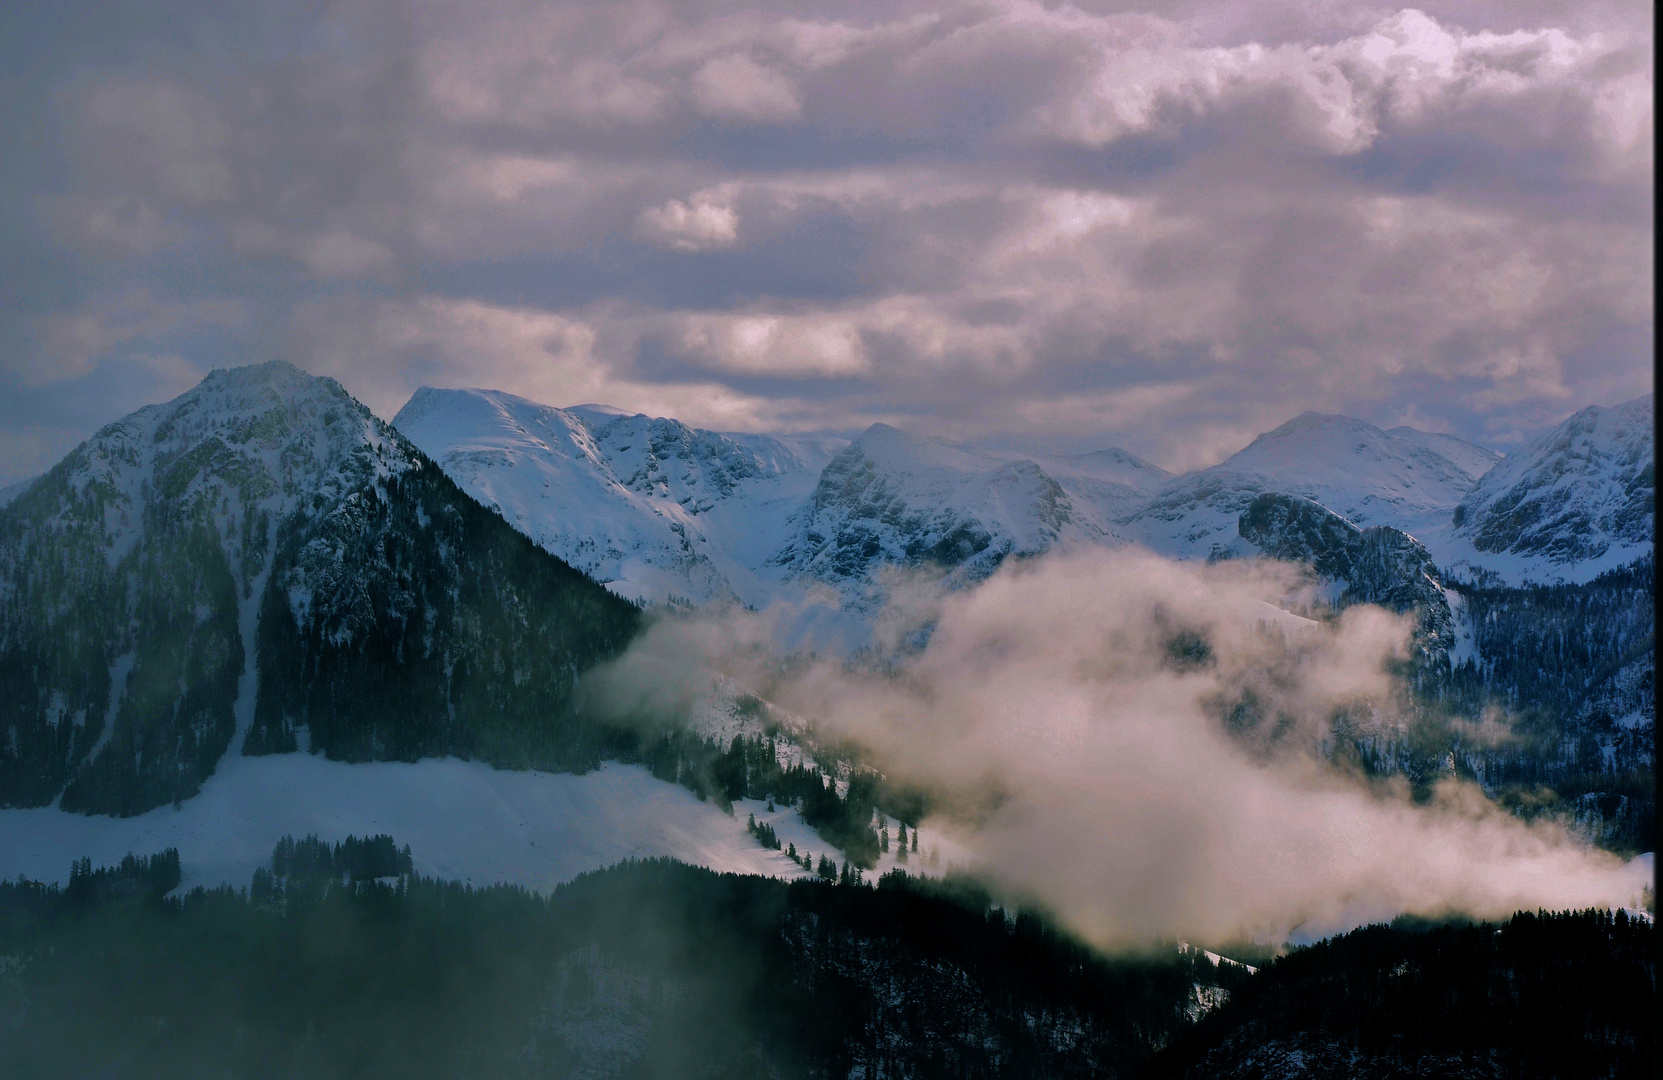 Alpenblick I